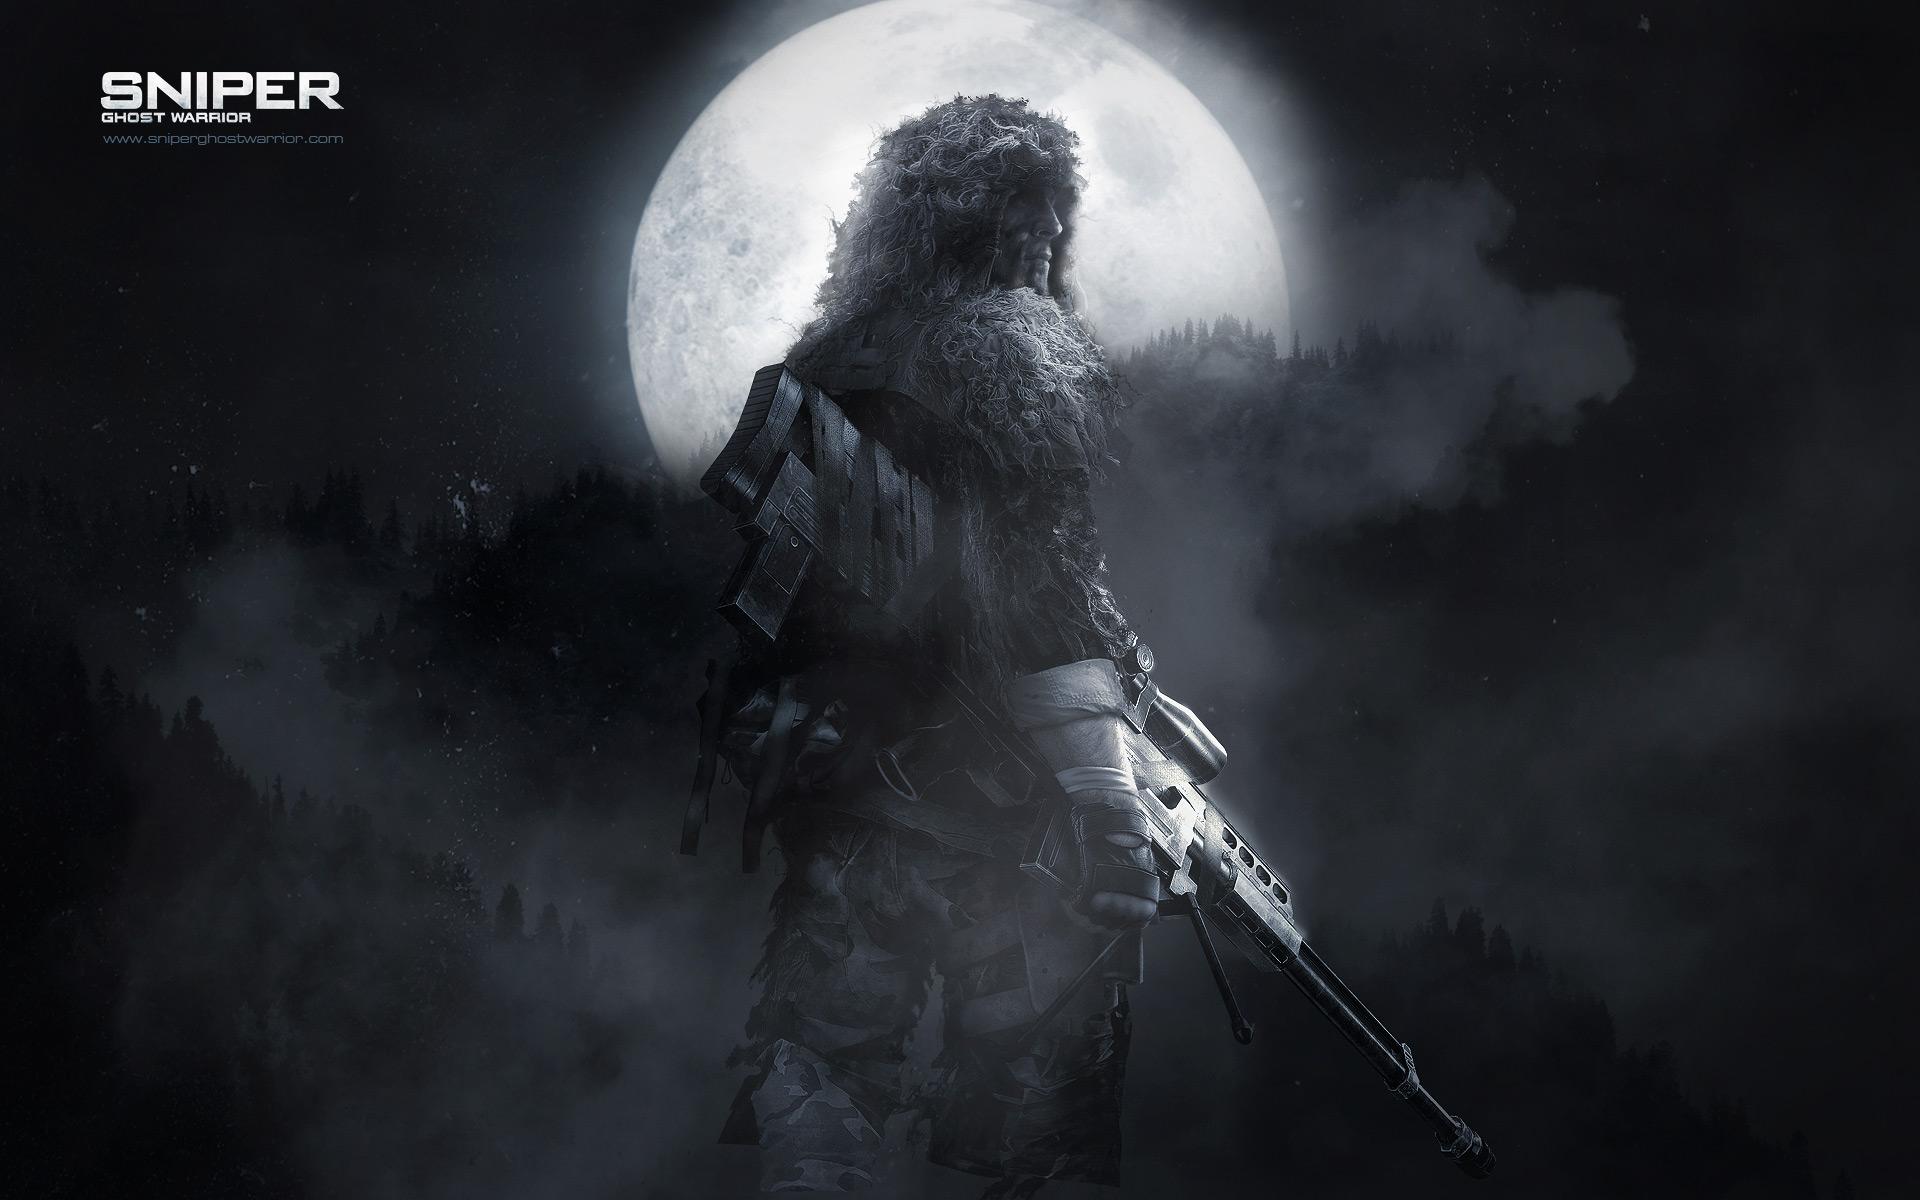 Sniper Ghost Warrior Wallpapers Screenshots HQ 1920x1200